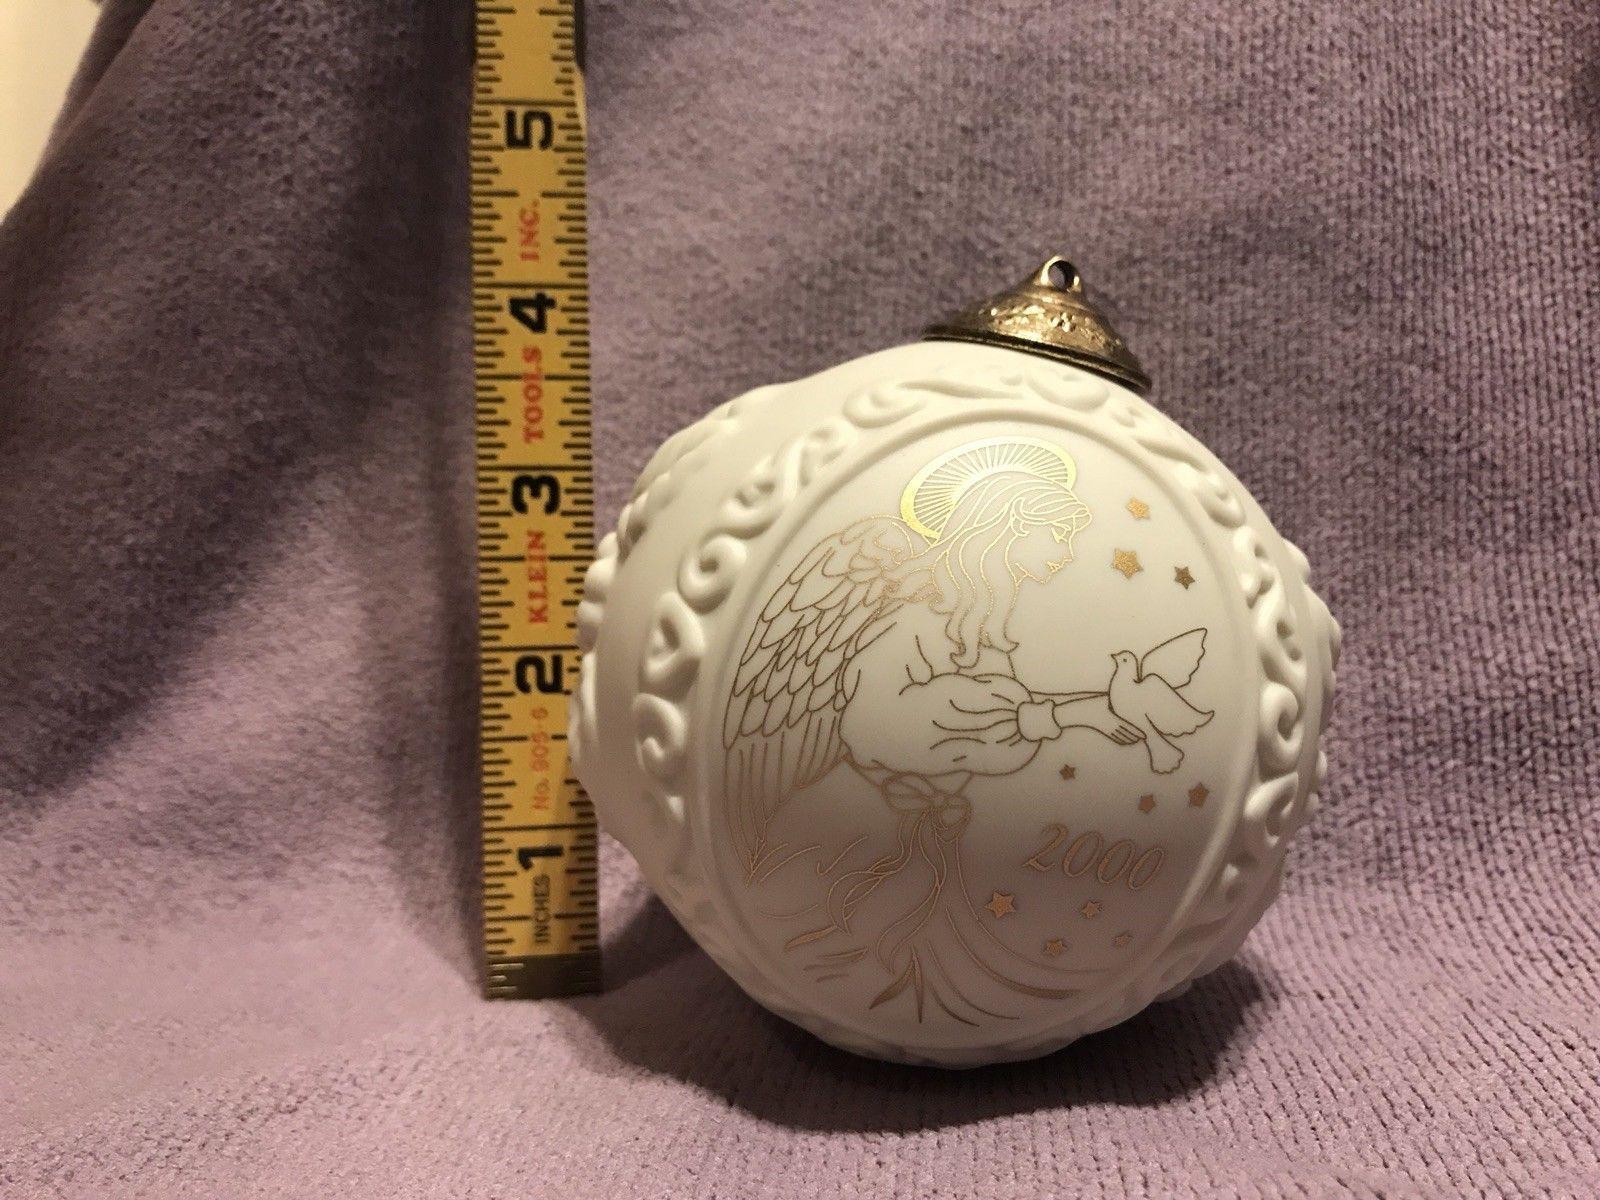 Wedgwood White Jasperware Year 2000 Ornament Christmas Ball with Gold Angel image 6